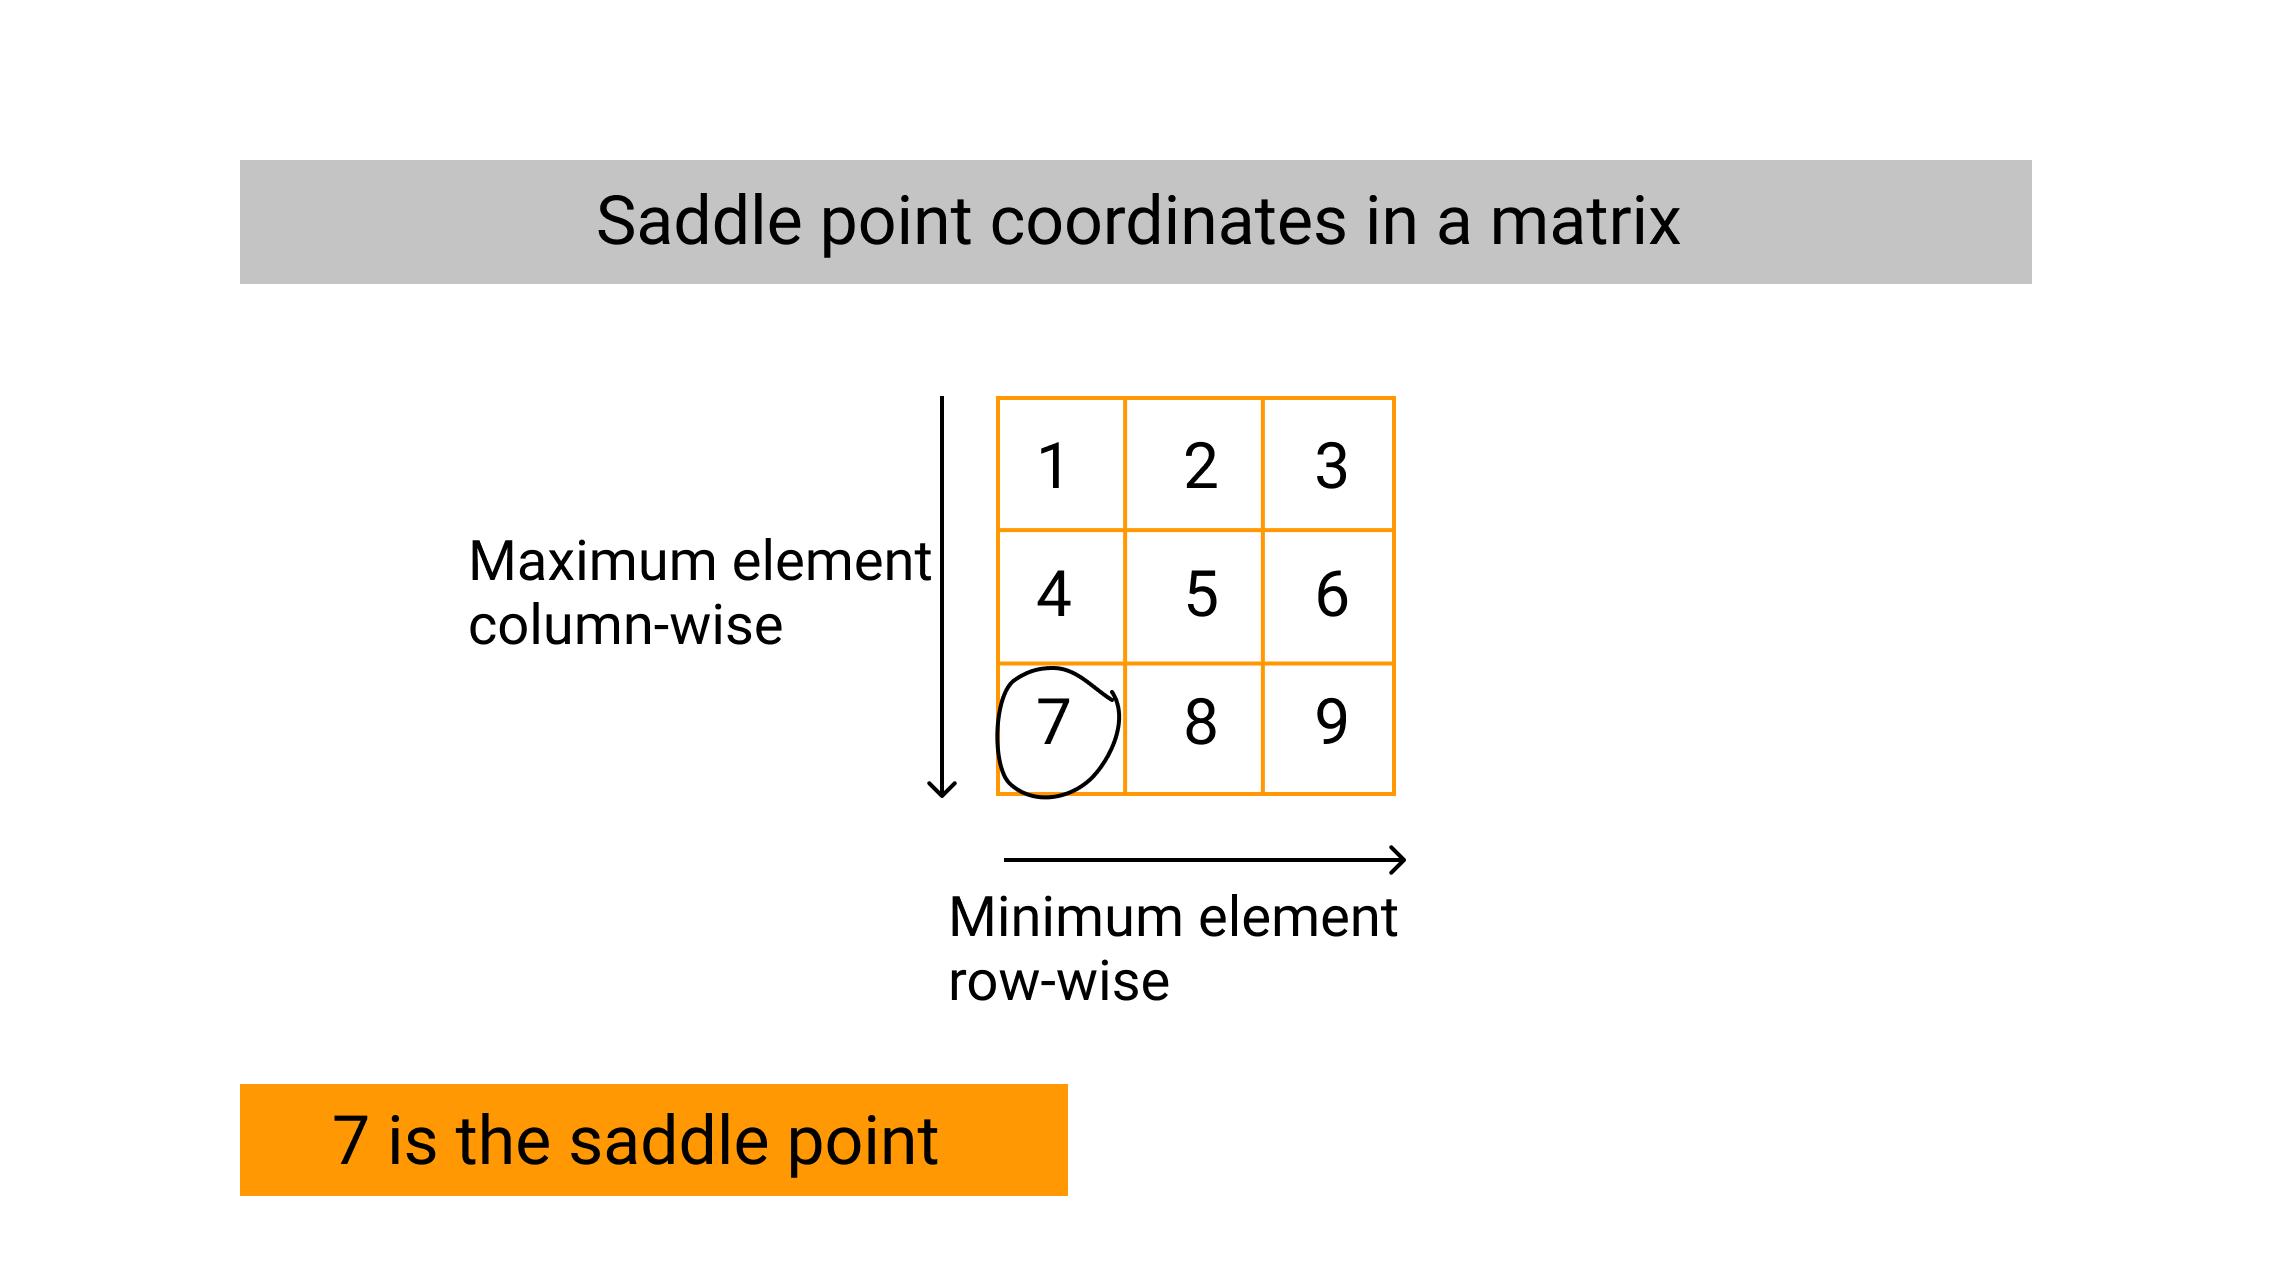 saddle point coordinates in a matrix